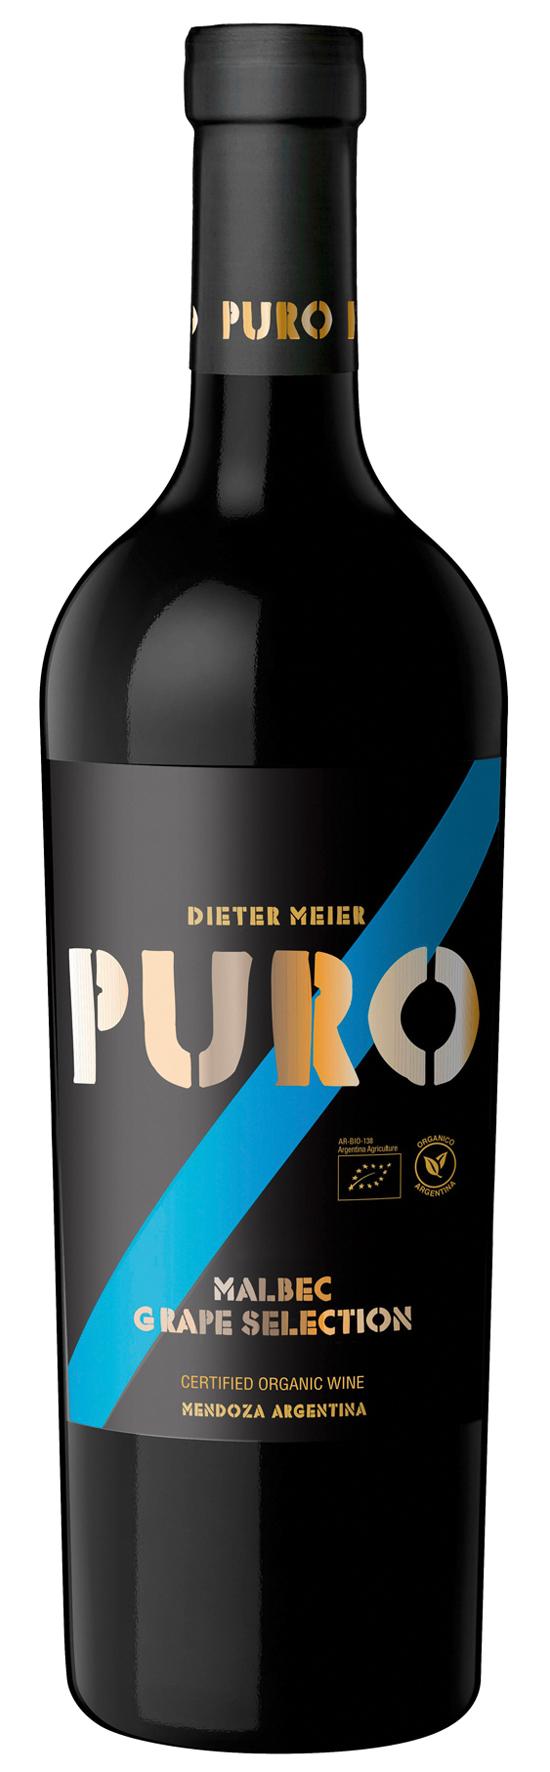 DIETER MEIER Puro Malbec Grape Selection 2014